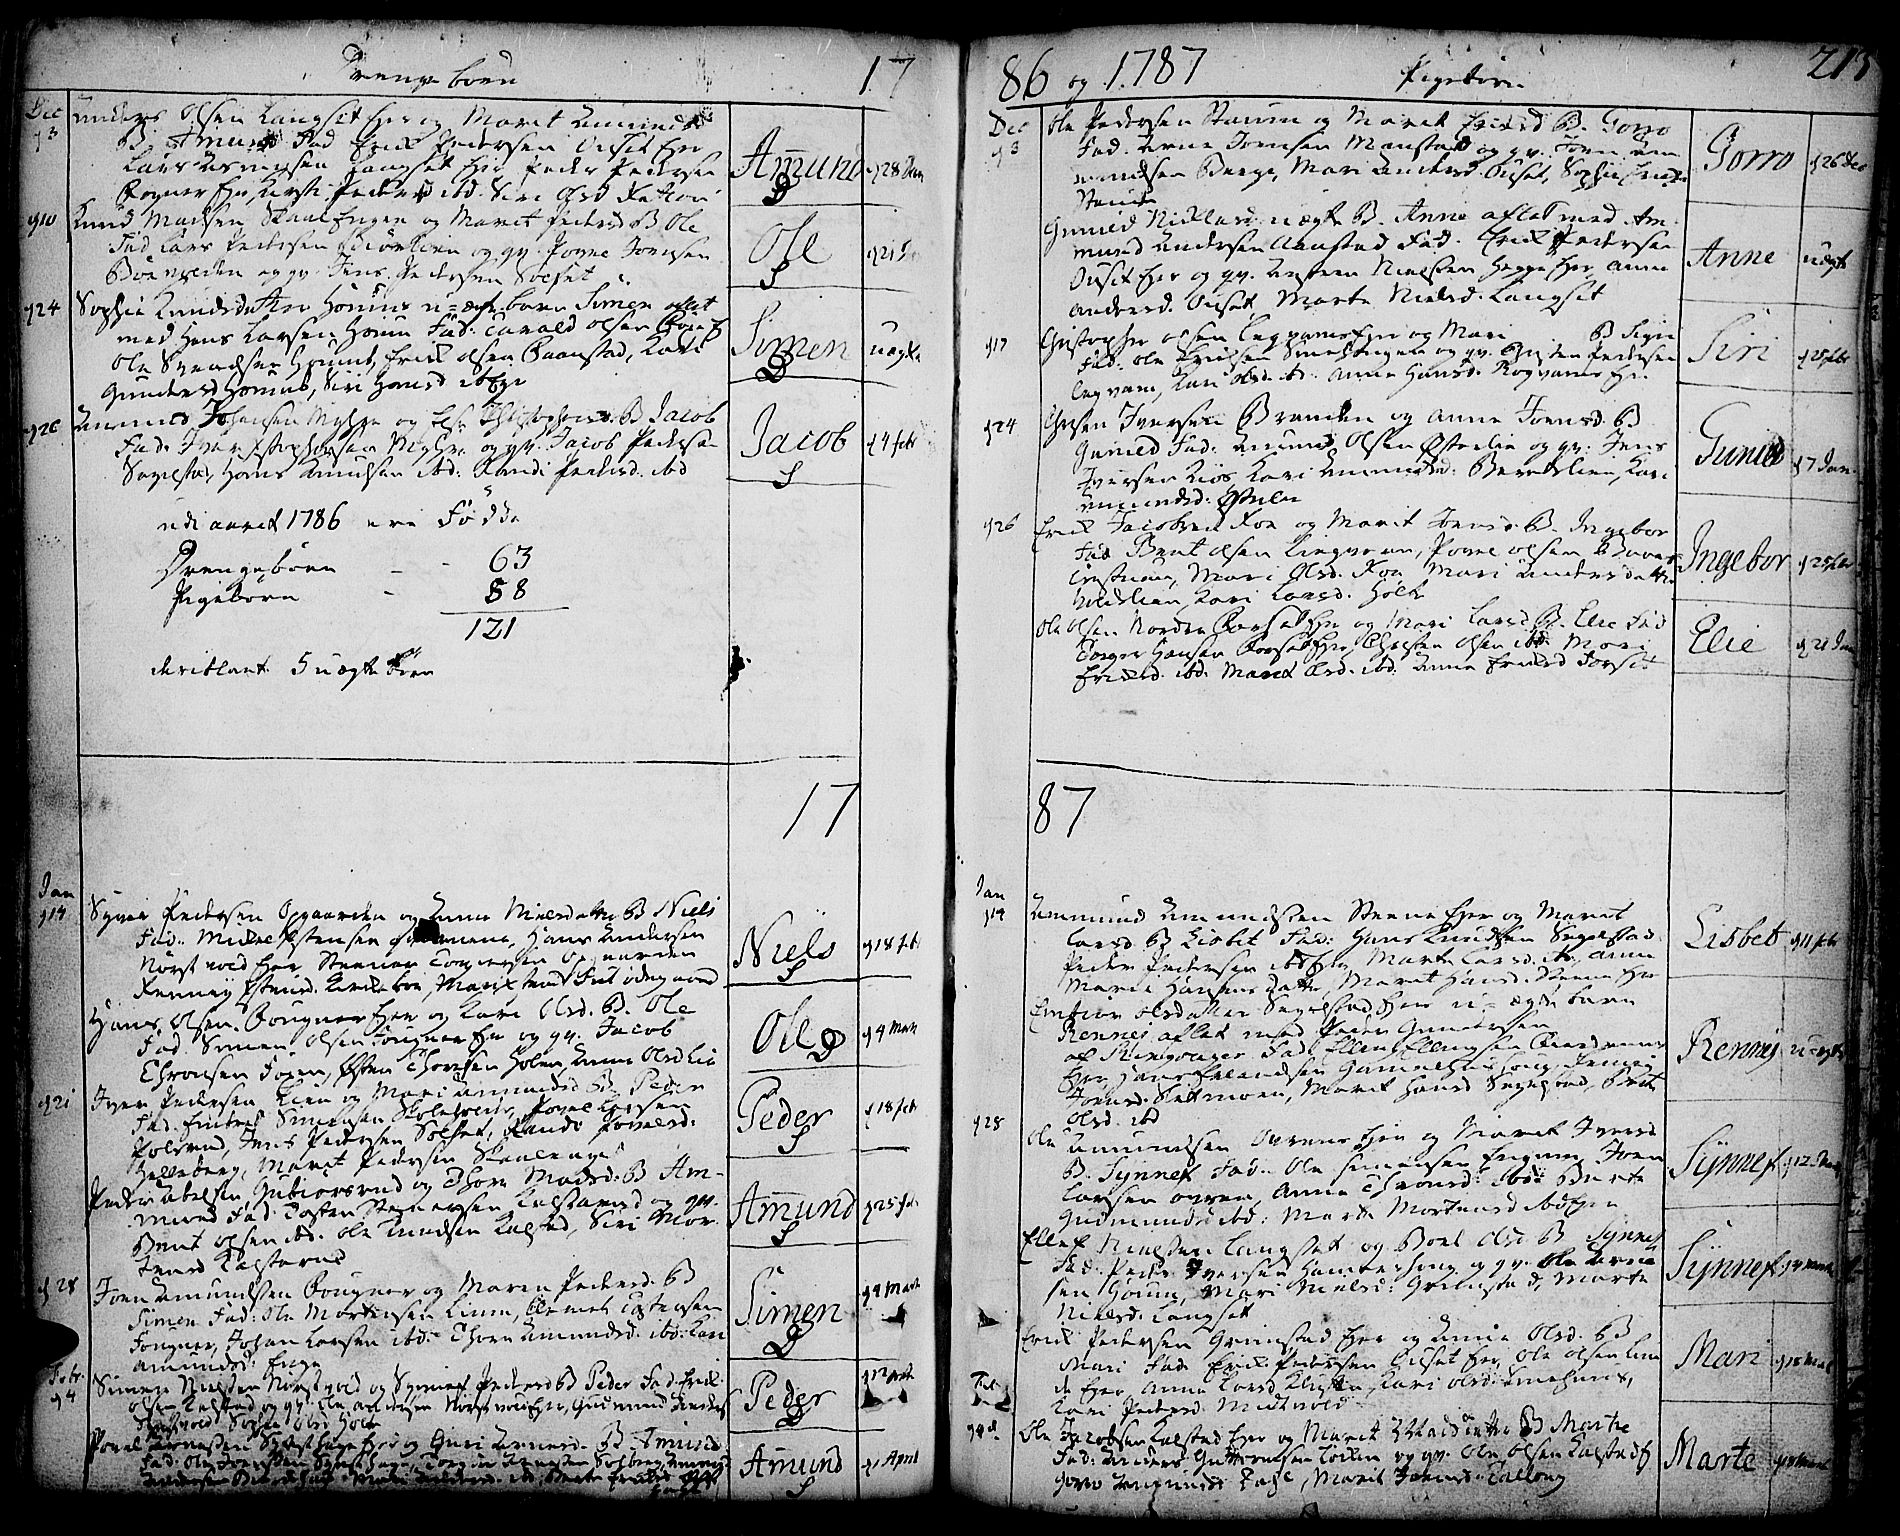 SAH, Gausdal prestekontor, Ministerialbok nr. 3, 1758-1809, s. 213